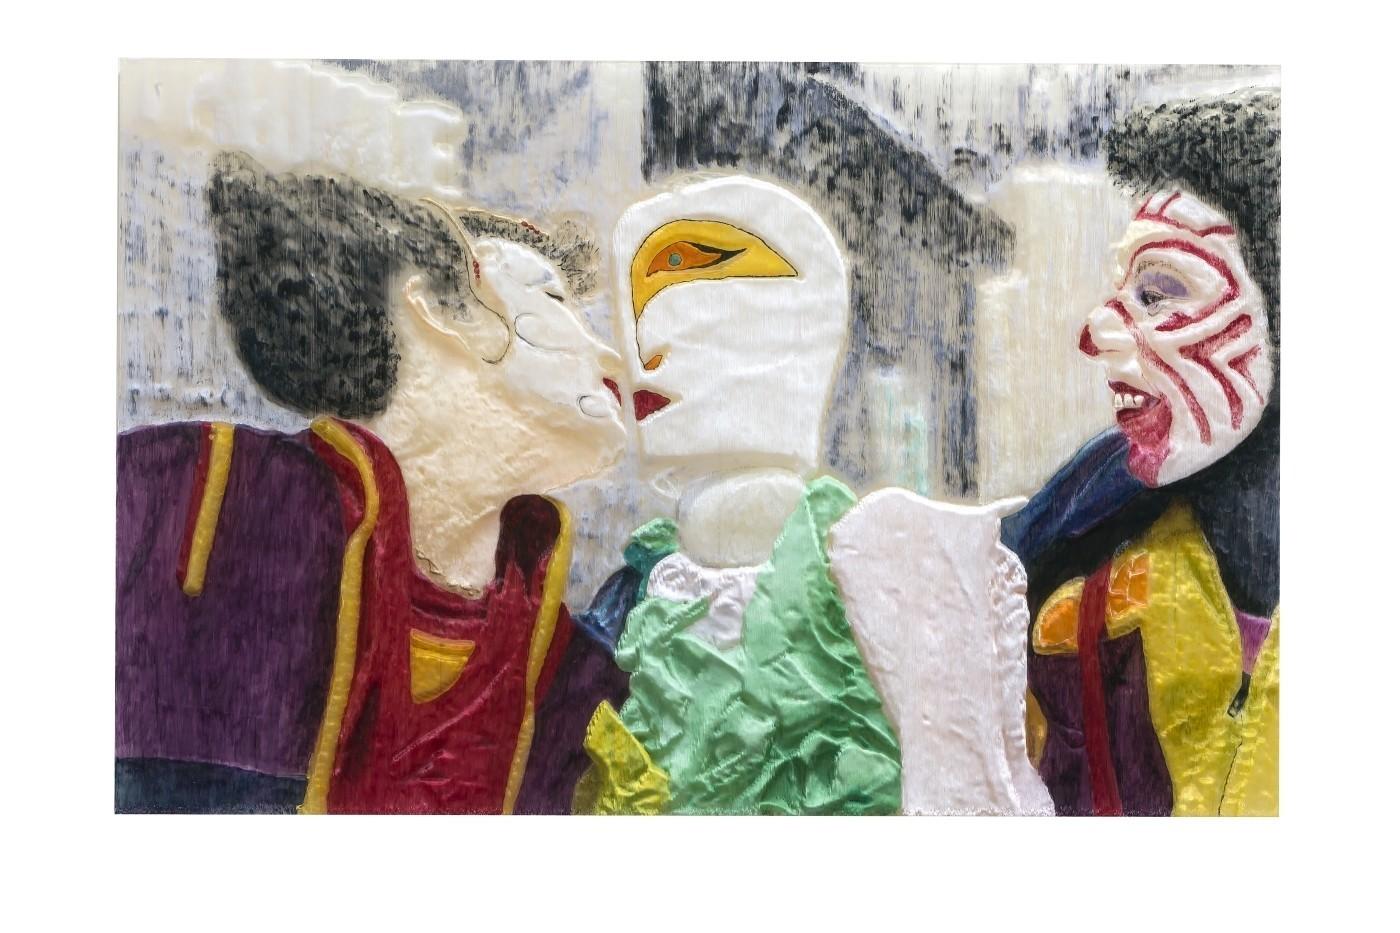 quadri 3d arredo casa Art 09 Quadro Funny Love dipinto a mano